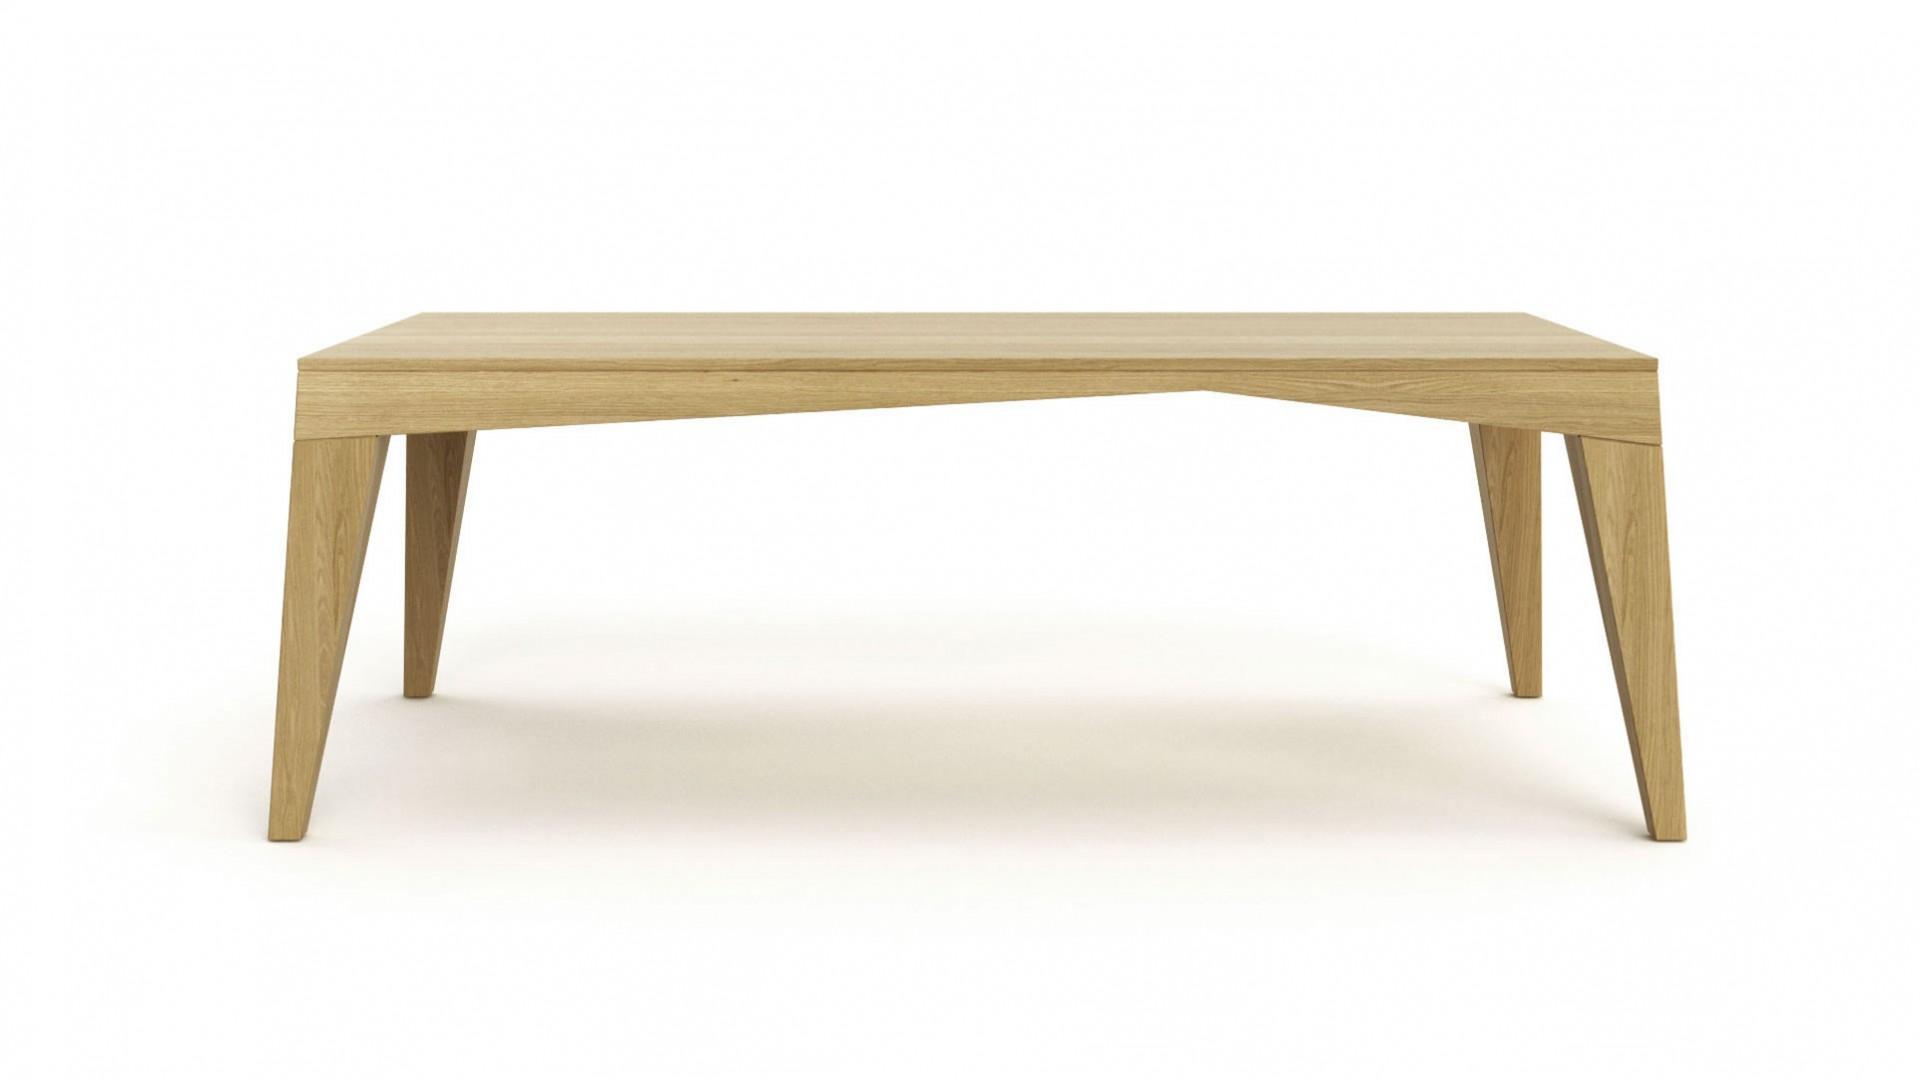 Jedálenský stôl ROCK, masívny dub, jedálenský stôl z masívneho dreva, masívny dubový stôl, masívny drevený stôl cubica, moderný dubový stôl